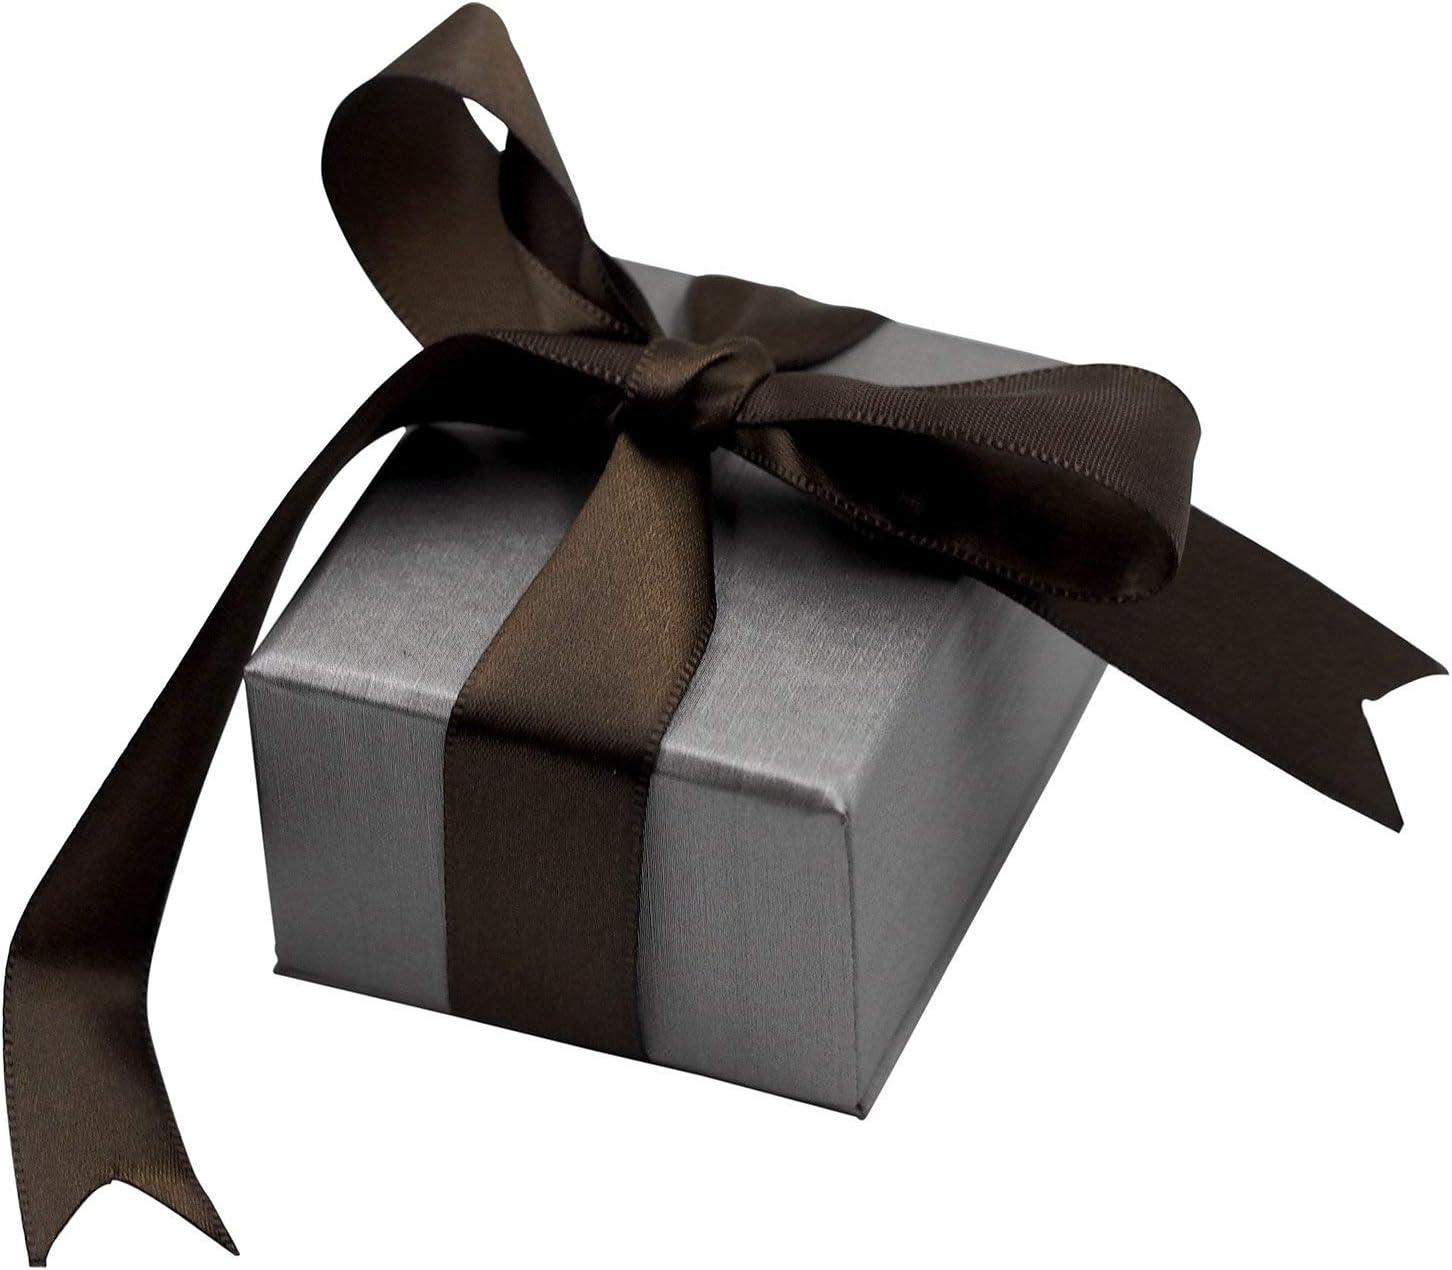 CuteBox Steel Grey Elegant Ribbon 2. 希少 Box 低価格 6-Pack Earring Jewelry